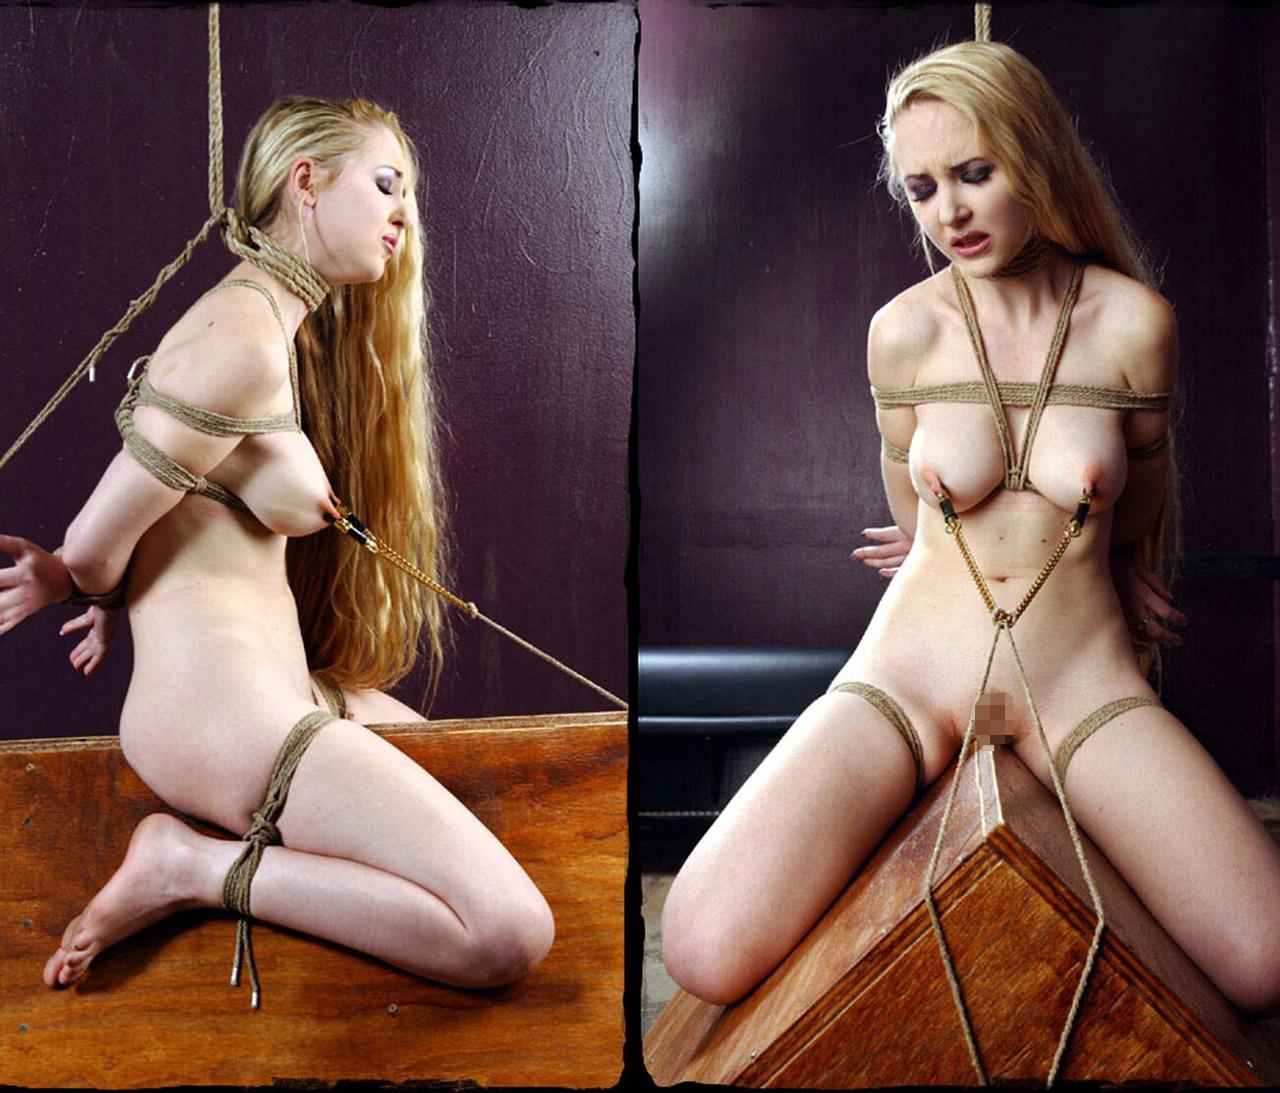 【SMエロ画像】鋭利な背中に乗って絶叫するM女たちの三角木馬拷問www 10